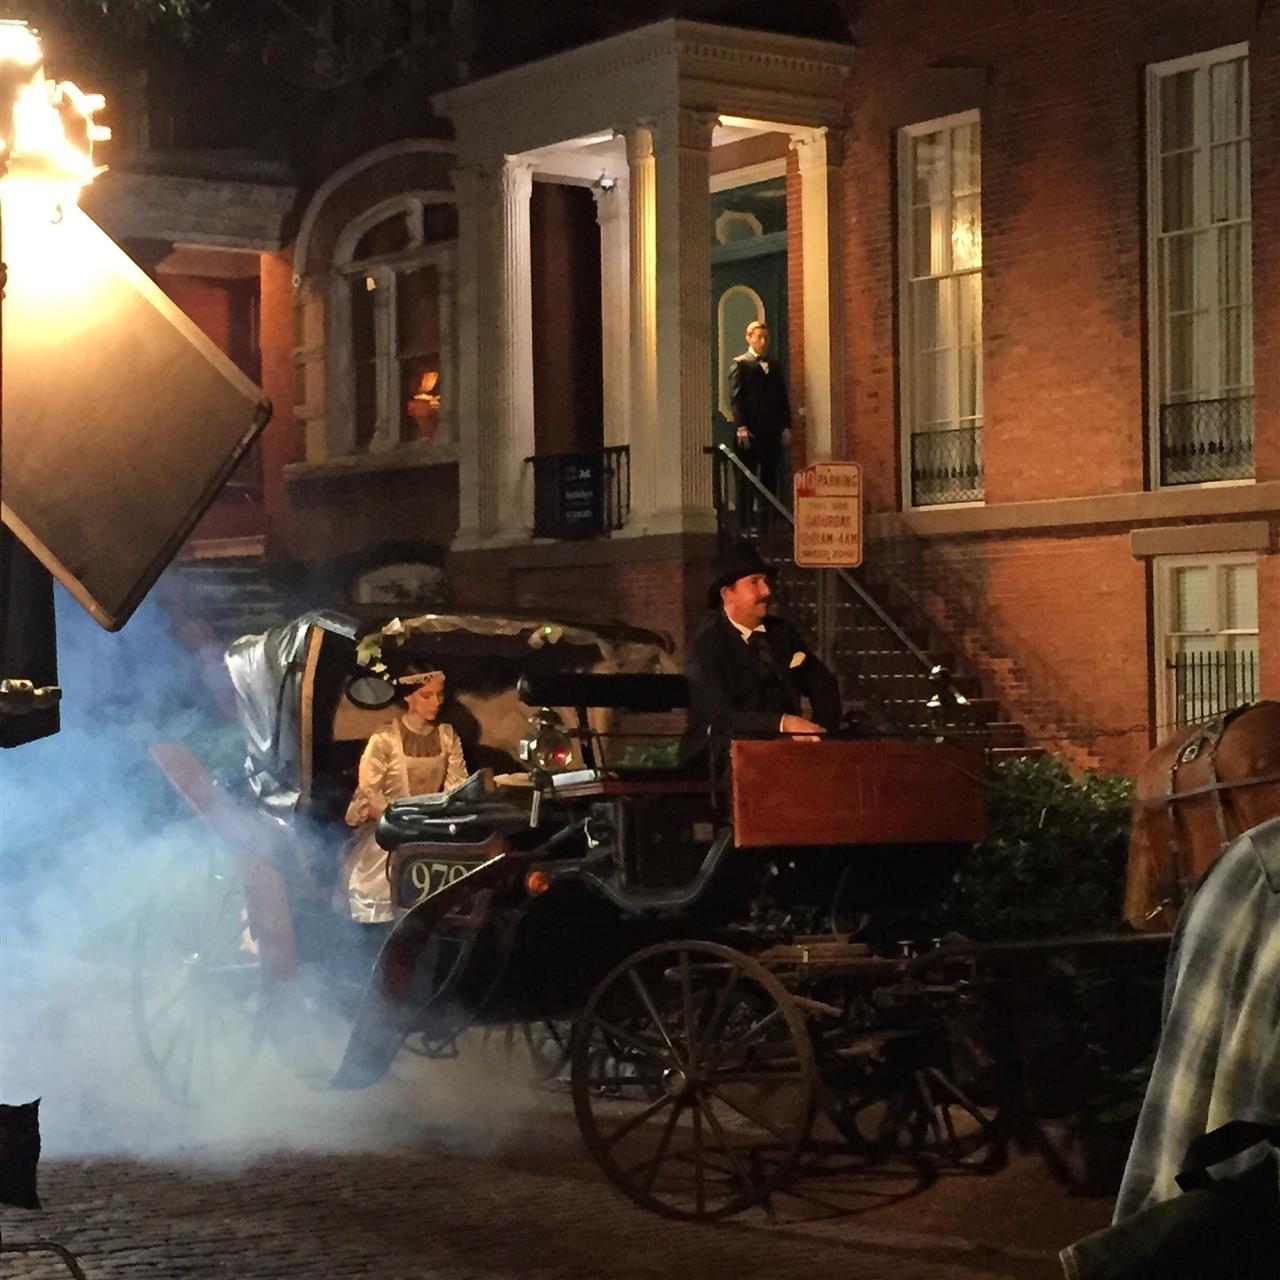 Movie Night in Savannah!